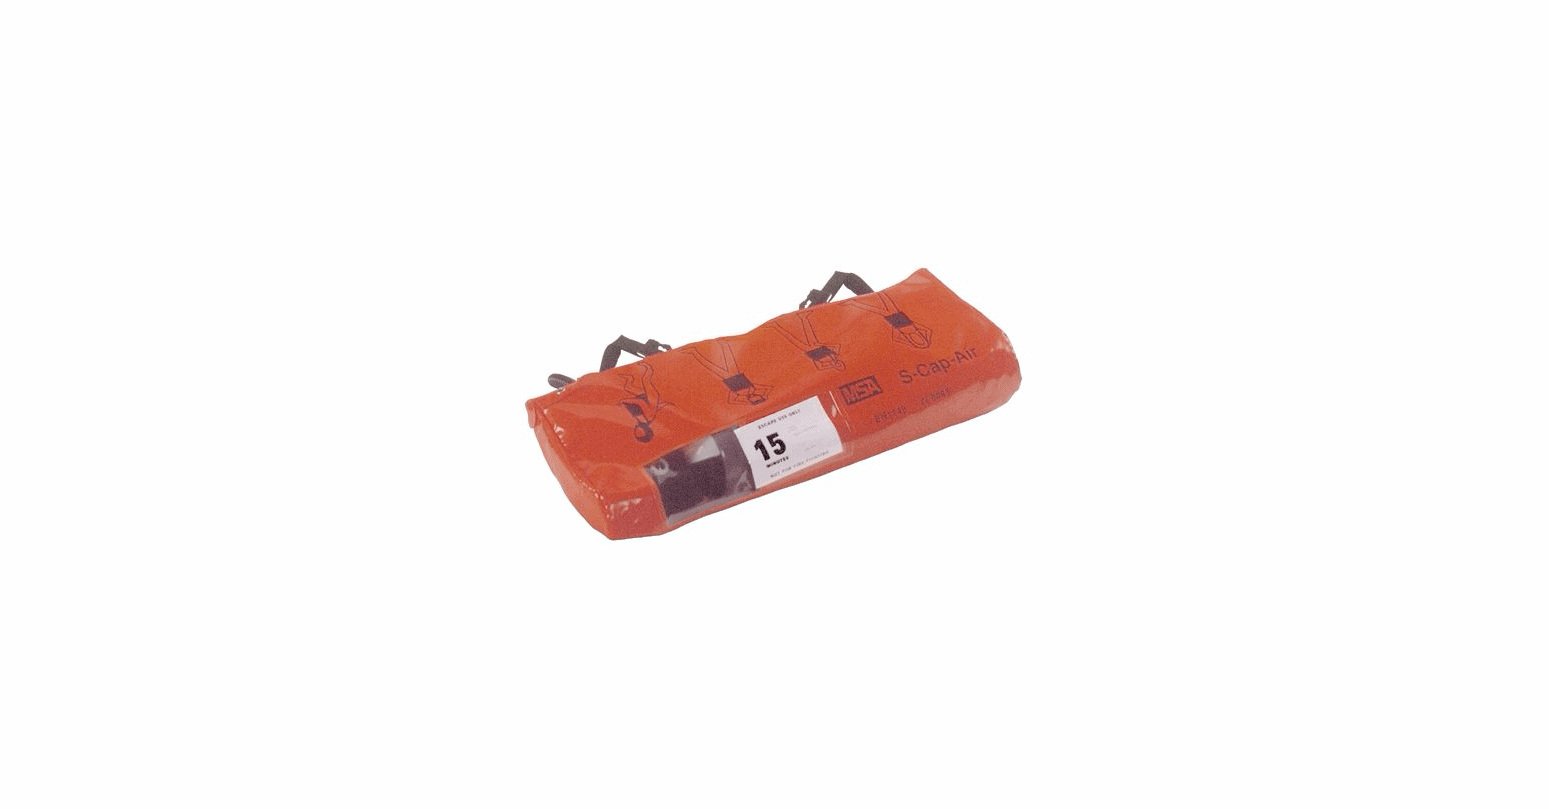 Msa S Cap Air Hooded Escape Set Composite Cylinder